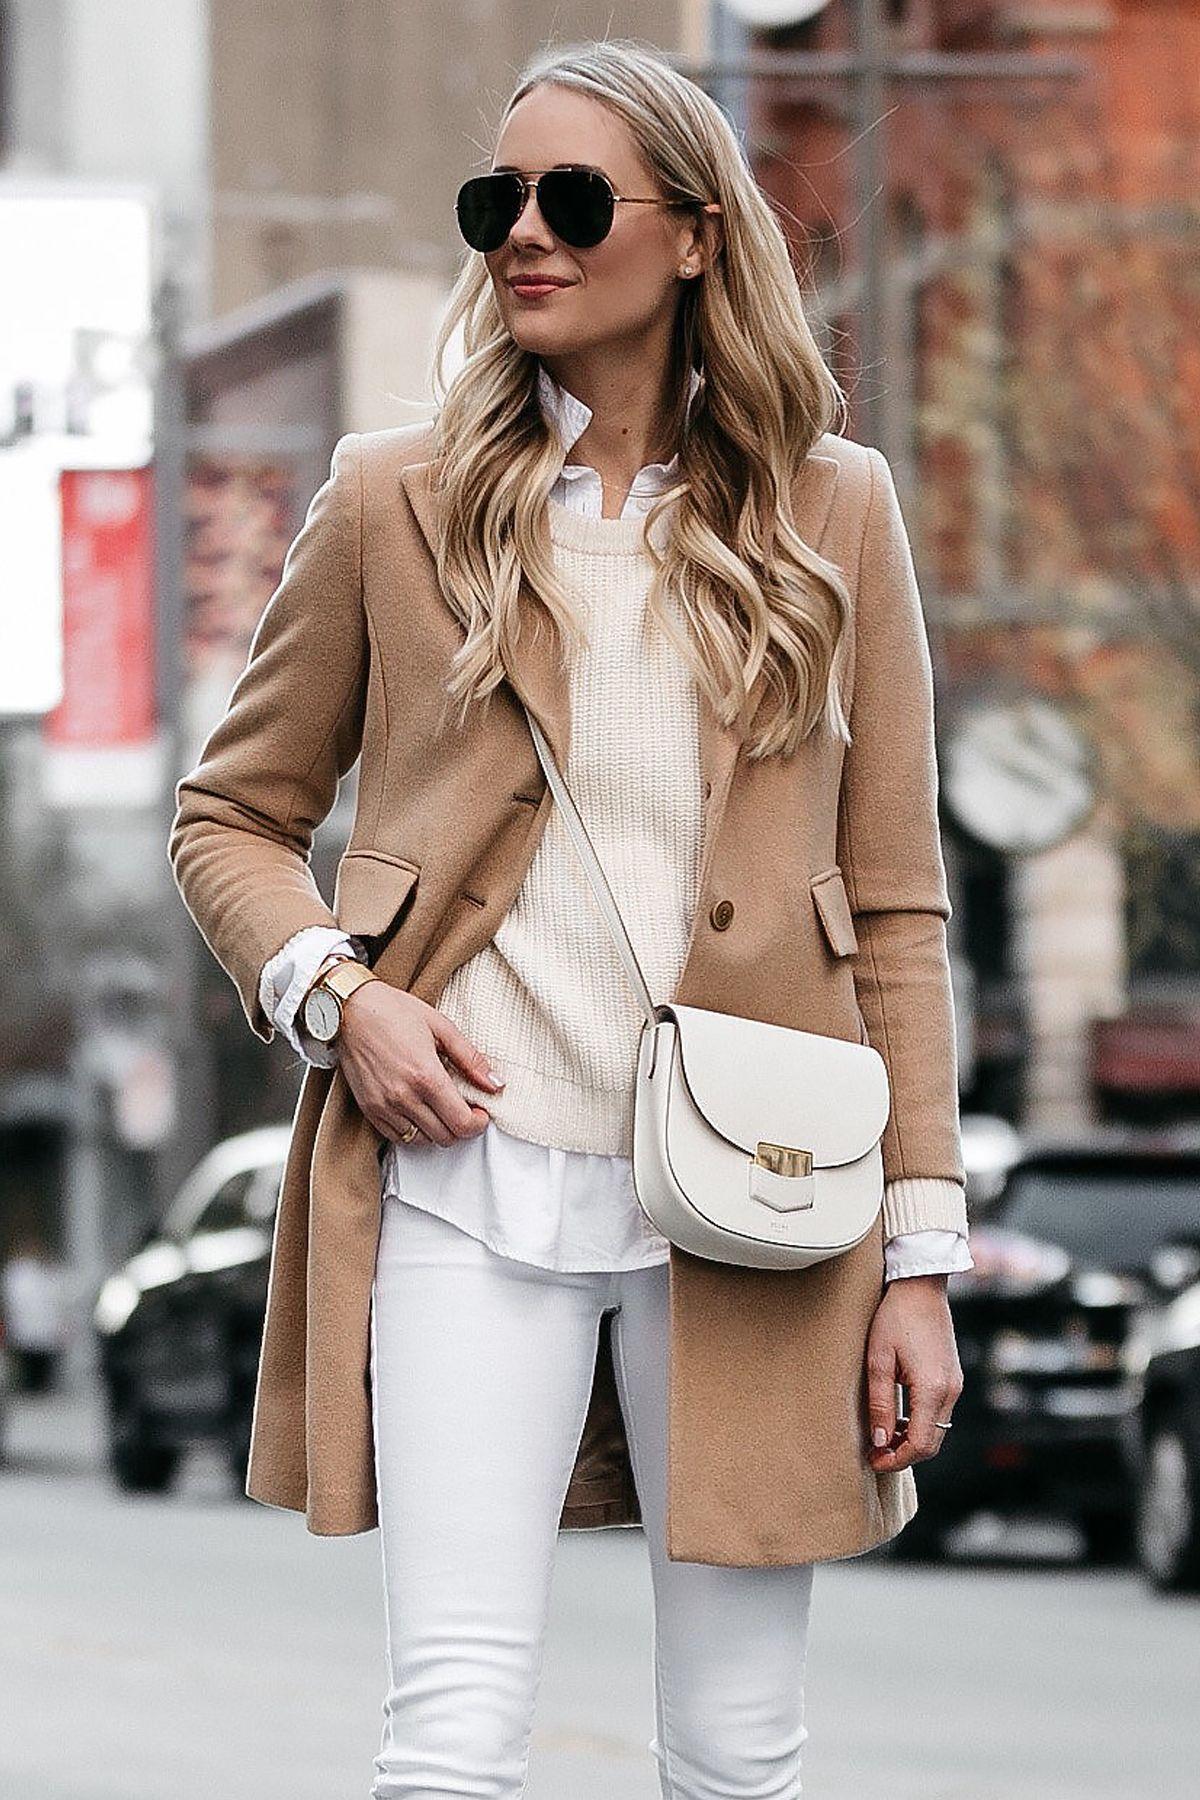 78e0105f4d4d Blonde Woman Wearing Camel Wool Coat White Skinny Jeans Celine Trotteur  White Handbag Fashion Jackson Dallas Blogger Fashion Blogger Street Style